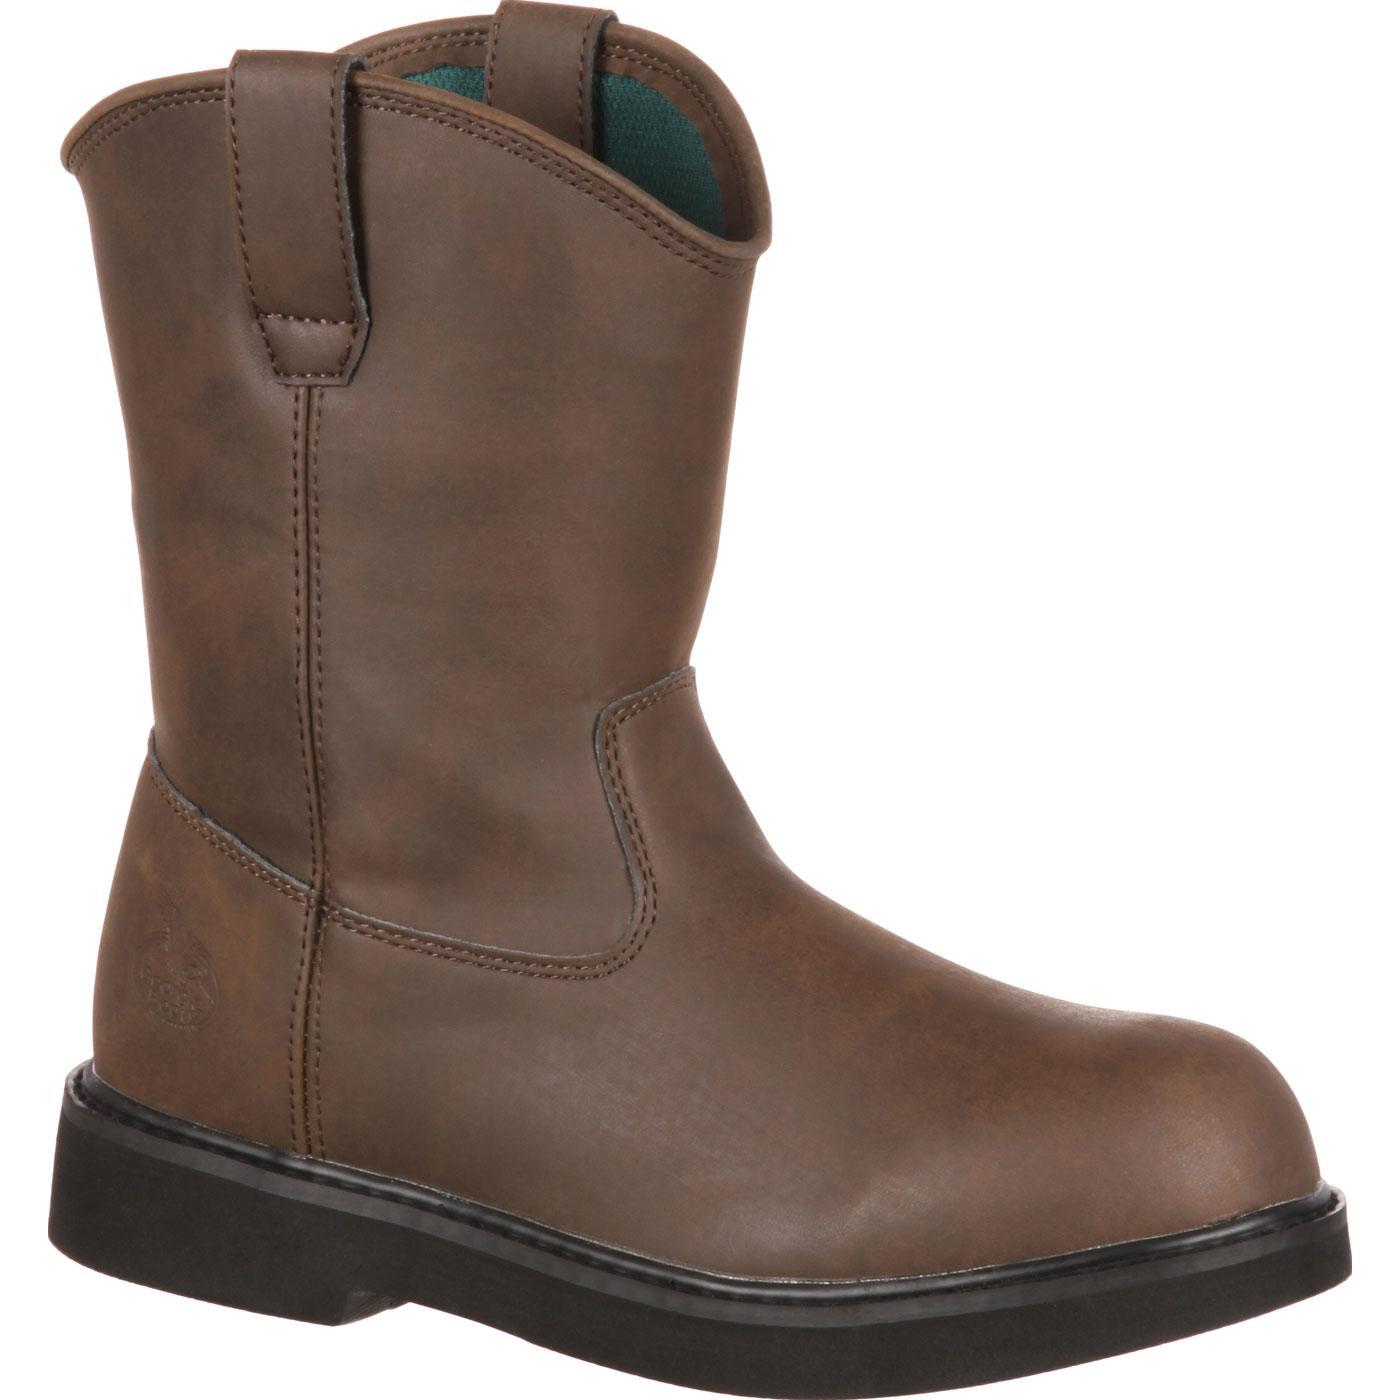 Georgia Boot Big Kid Comfort Pull On Boots Style G100